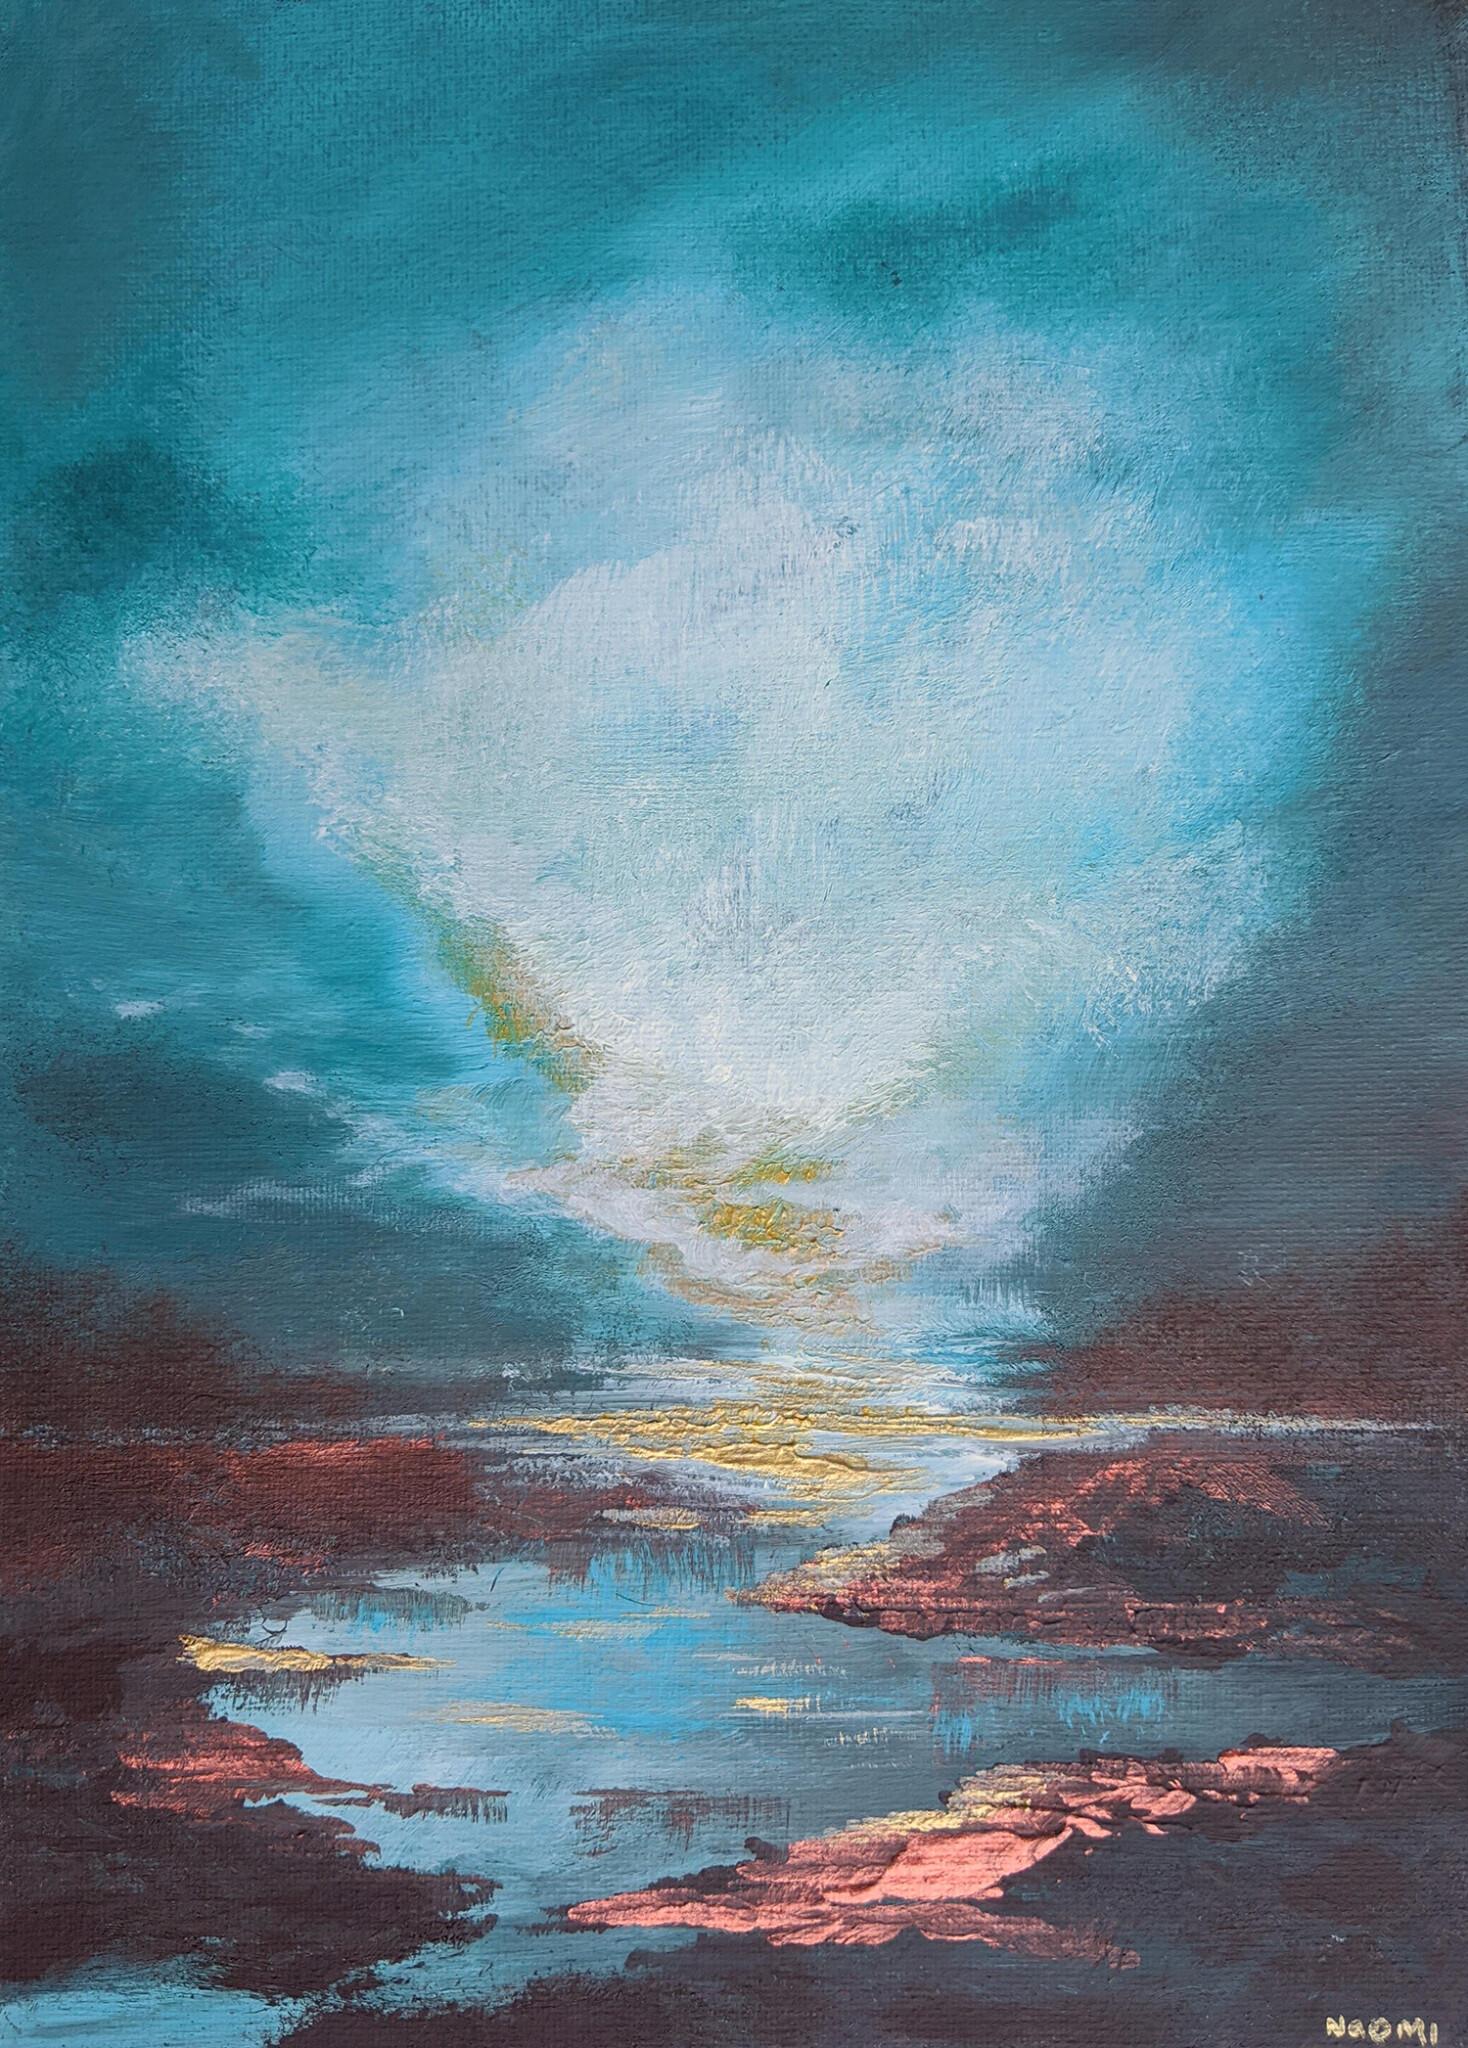 'Turquoise Skies' original acrylic painting, £70